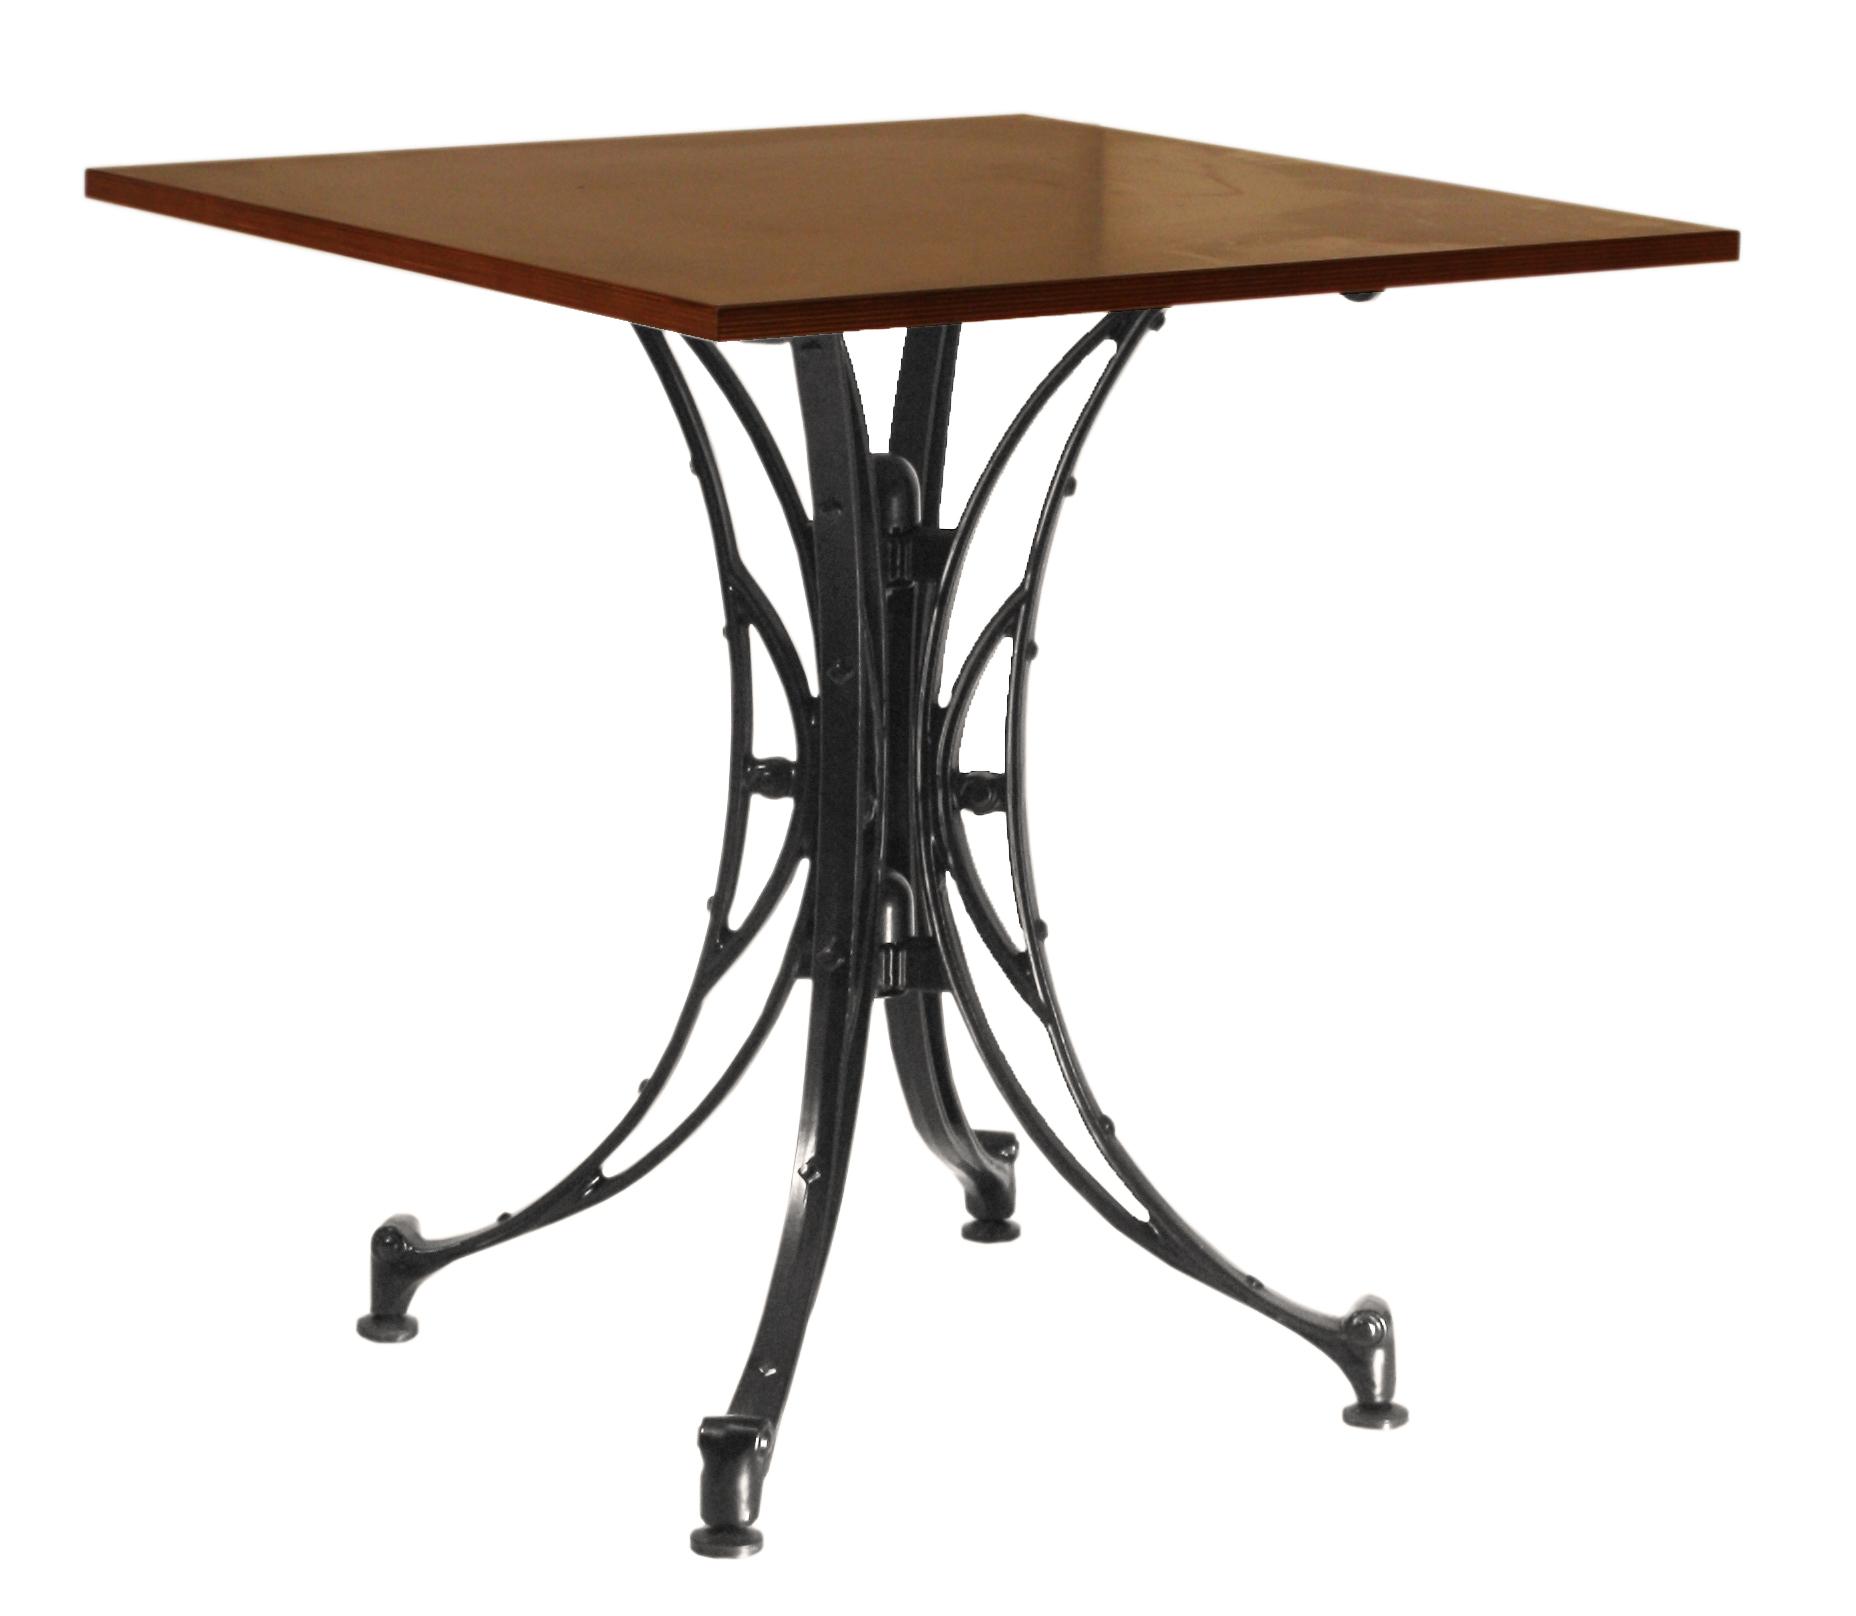 Pie Mesa Talavera 4 Dessimobel Dise O De Muebles En Aluminio  # Muebles Talavera